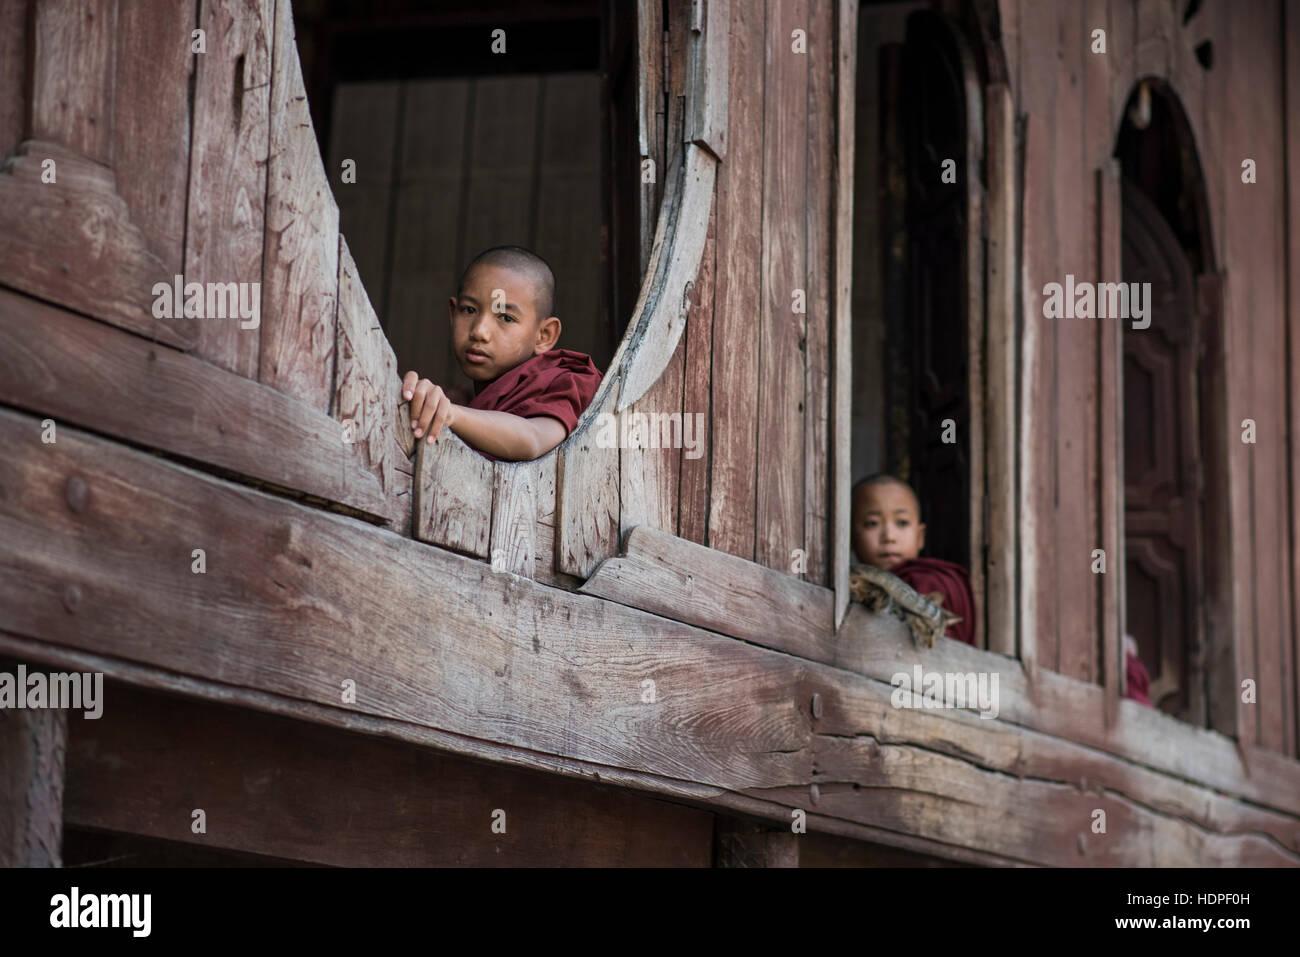 Les moines bouddhistes novice au monastère en bois de Shwe Yan Pyay à Nyaungshwe, Myanmar. Photo Stock